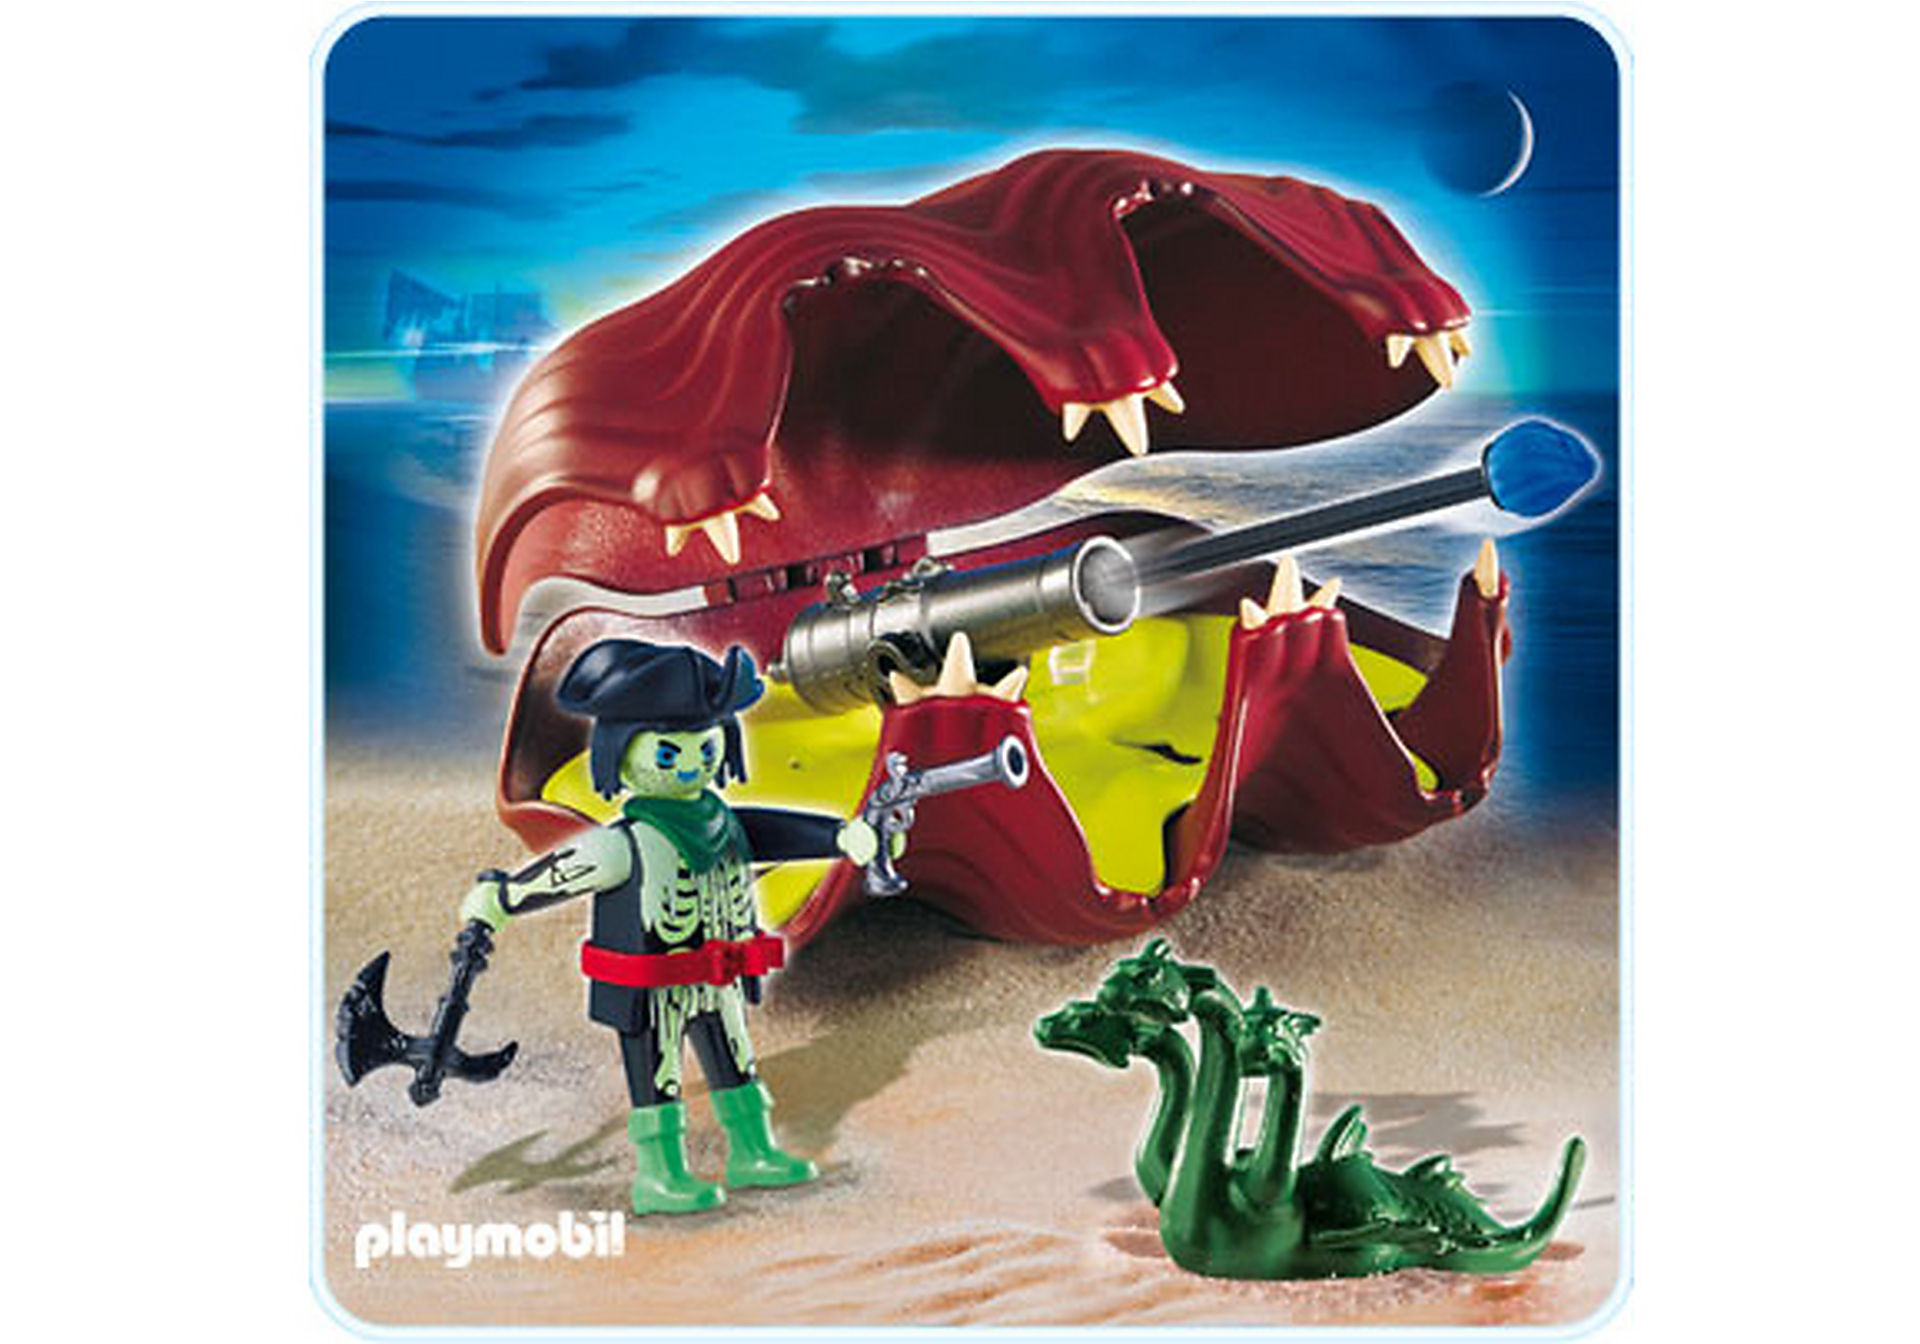 http://media.playmobil.com/i/playmobil/4802-A_product_detail/Kanonenmuschel